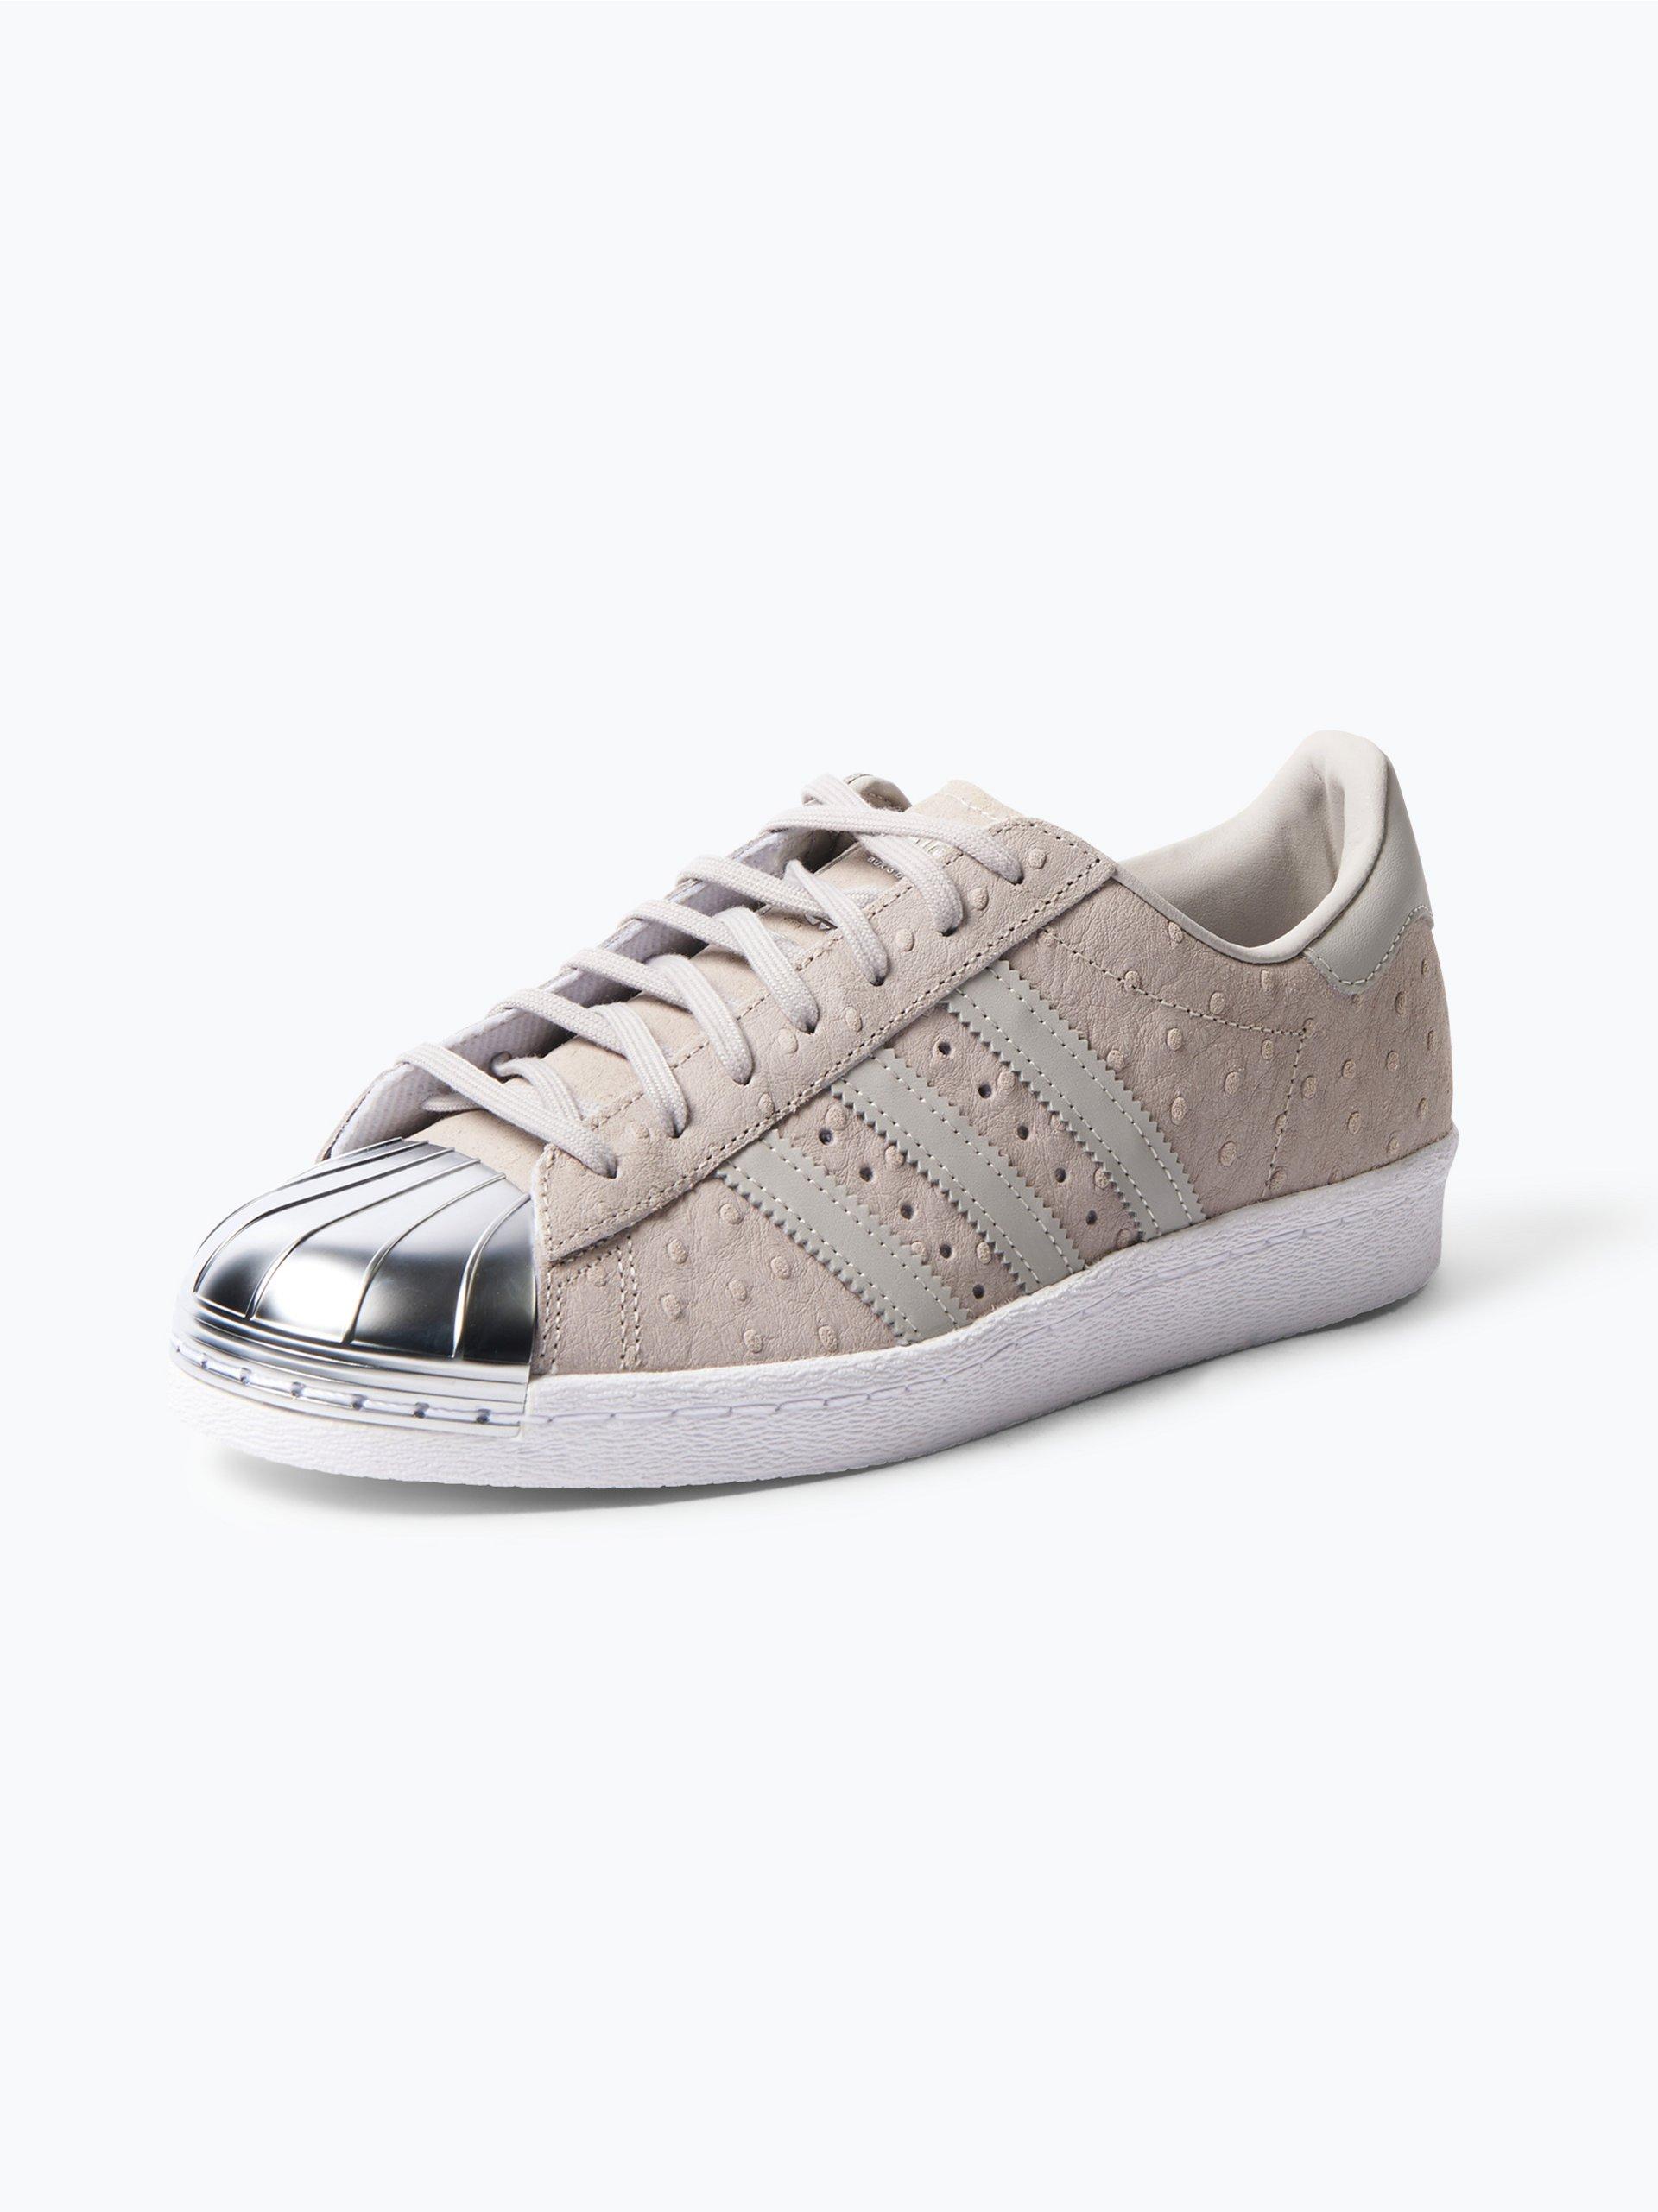 adidas originals damen sneaker aus leder superstar 80s metal beige uni online kaufen peek. Black Bedroom Furniture Sets. Home Design Ideas